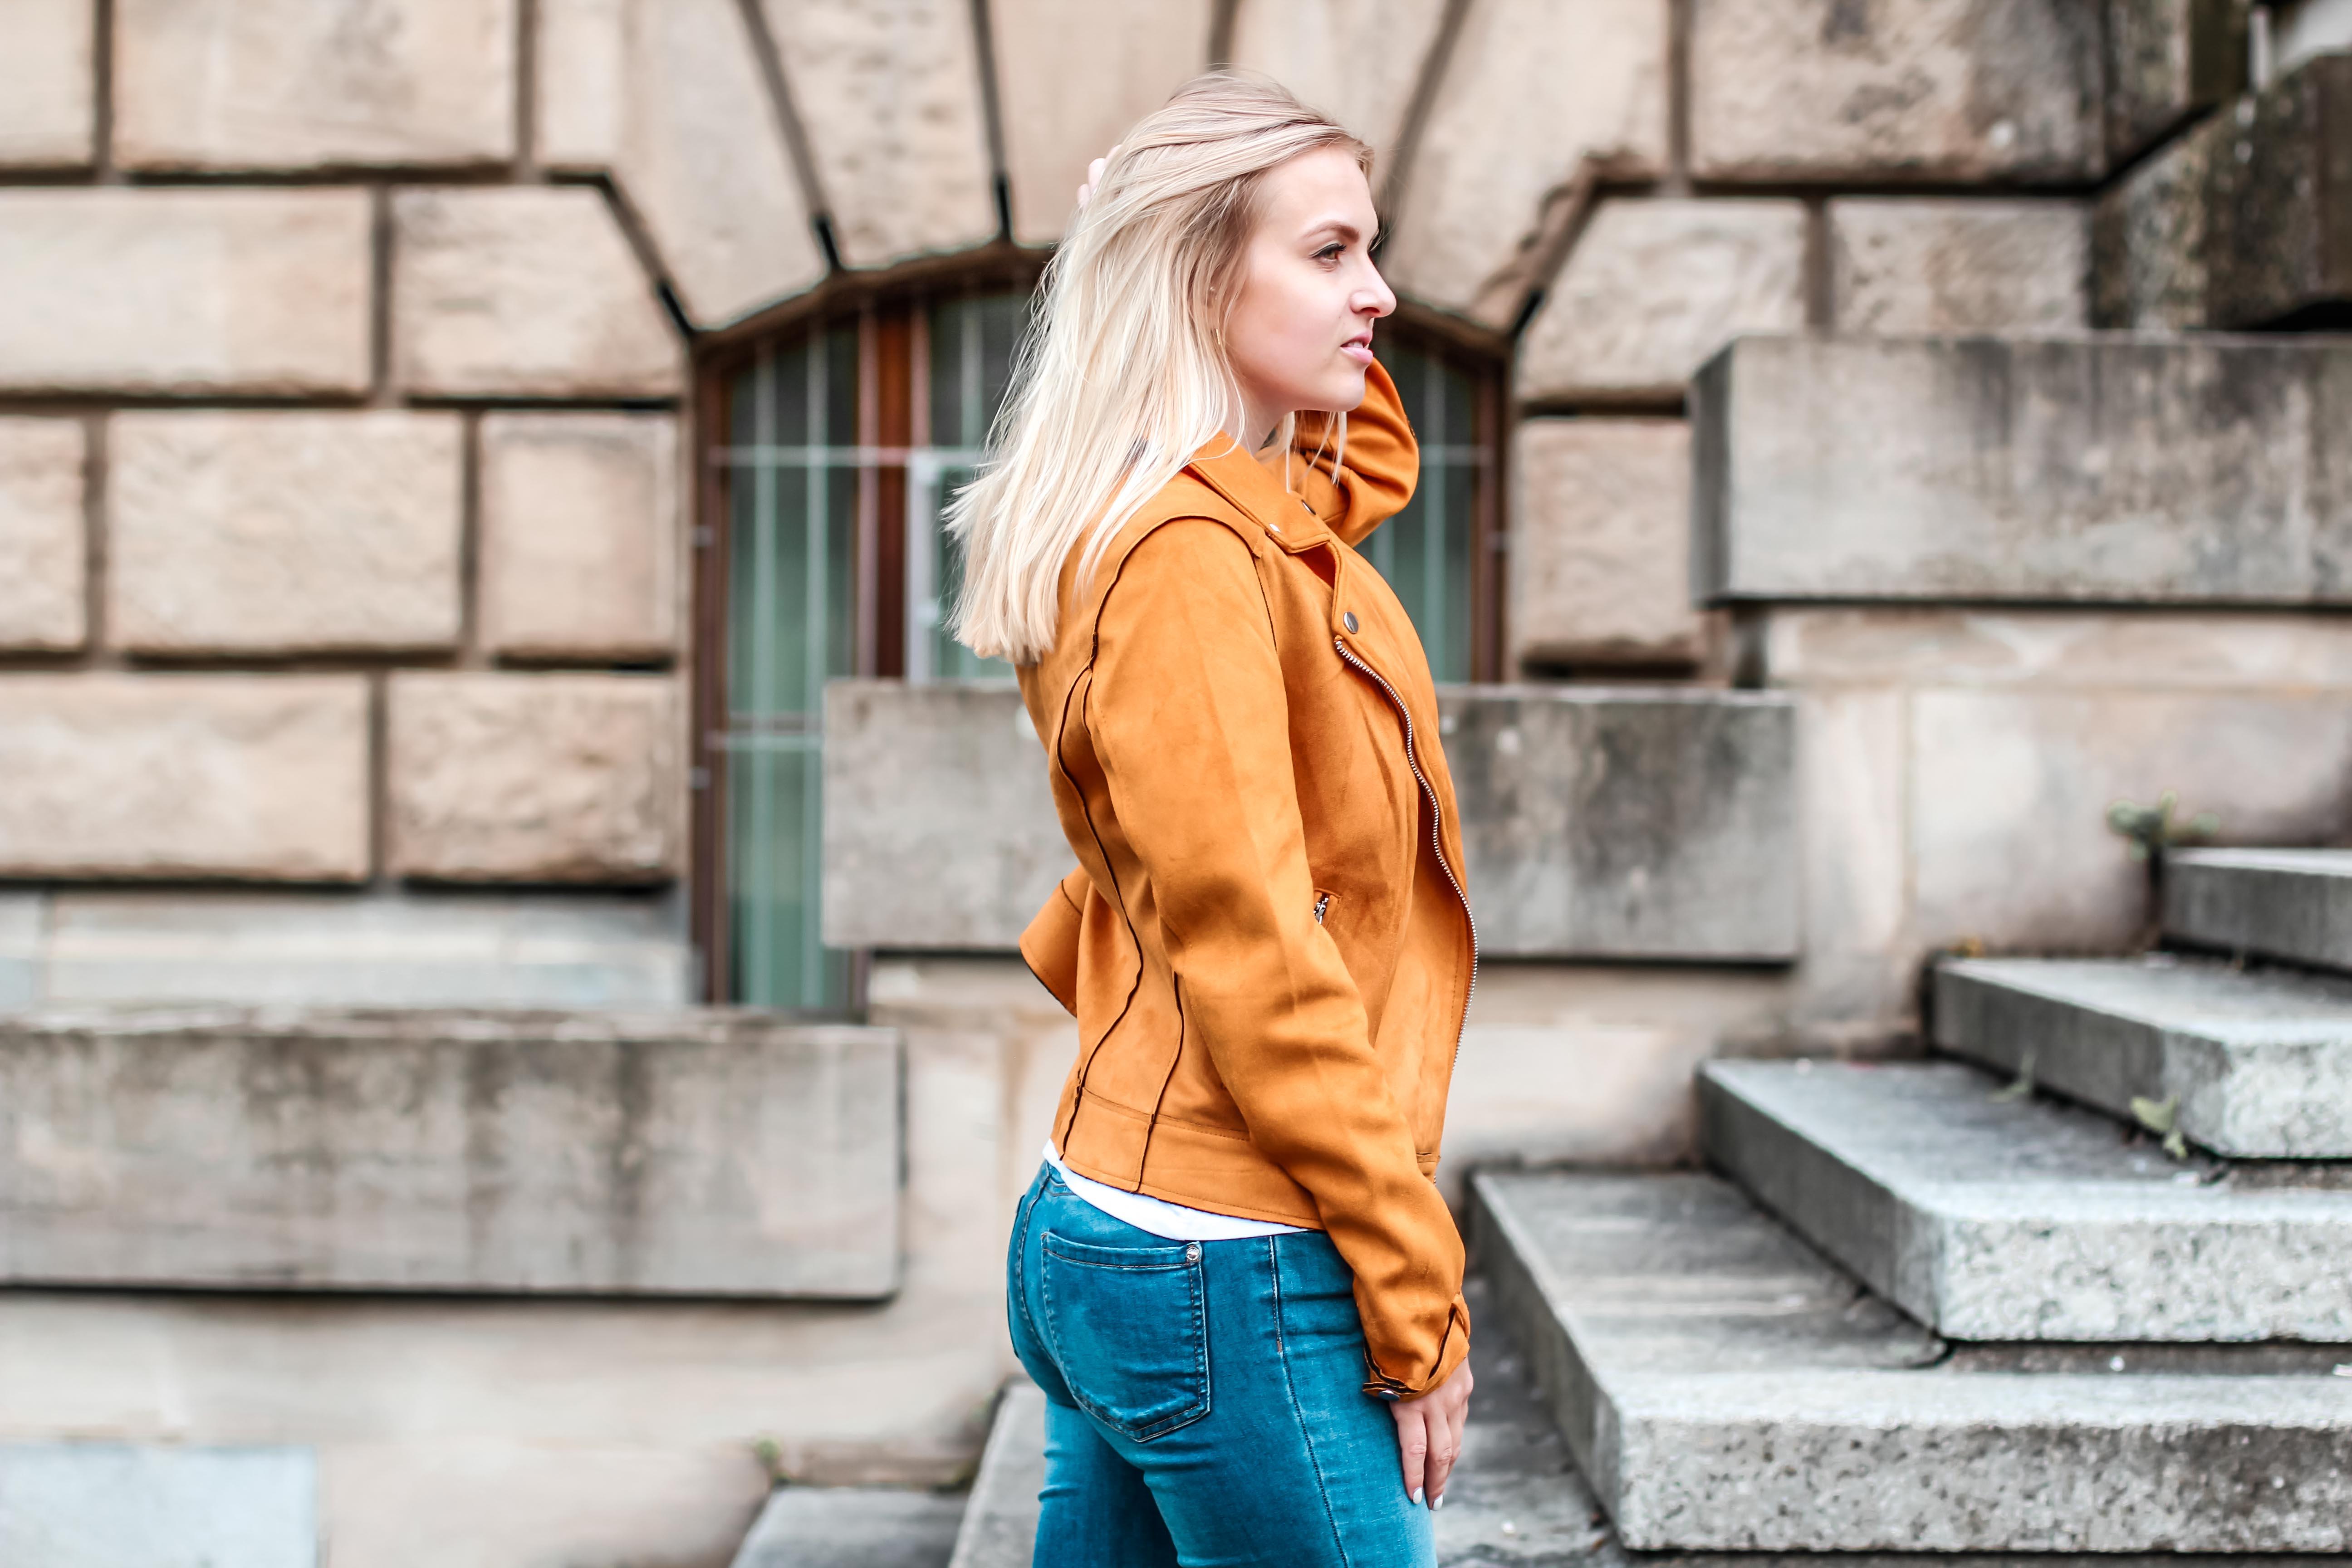 Fashion Kleiderschrank Must Haves Modeblog Fashionblog Katefully München ootd Lederjacke Blazer Basic Outfitinspiration Jeans Jeansjacke